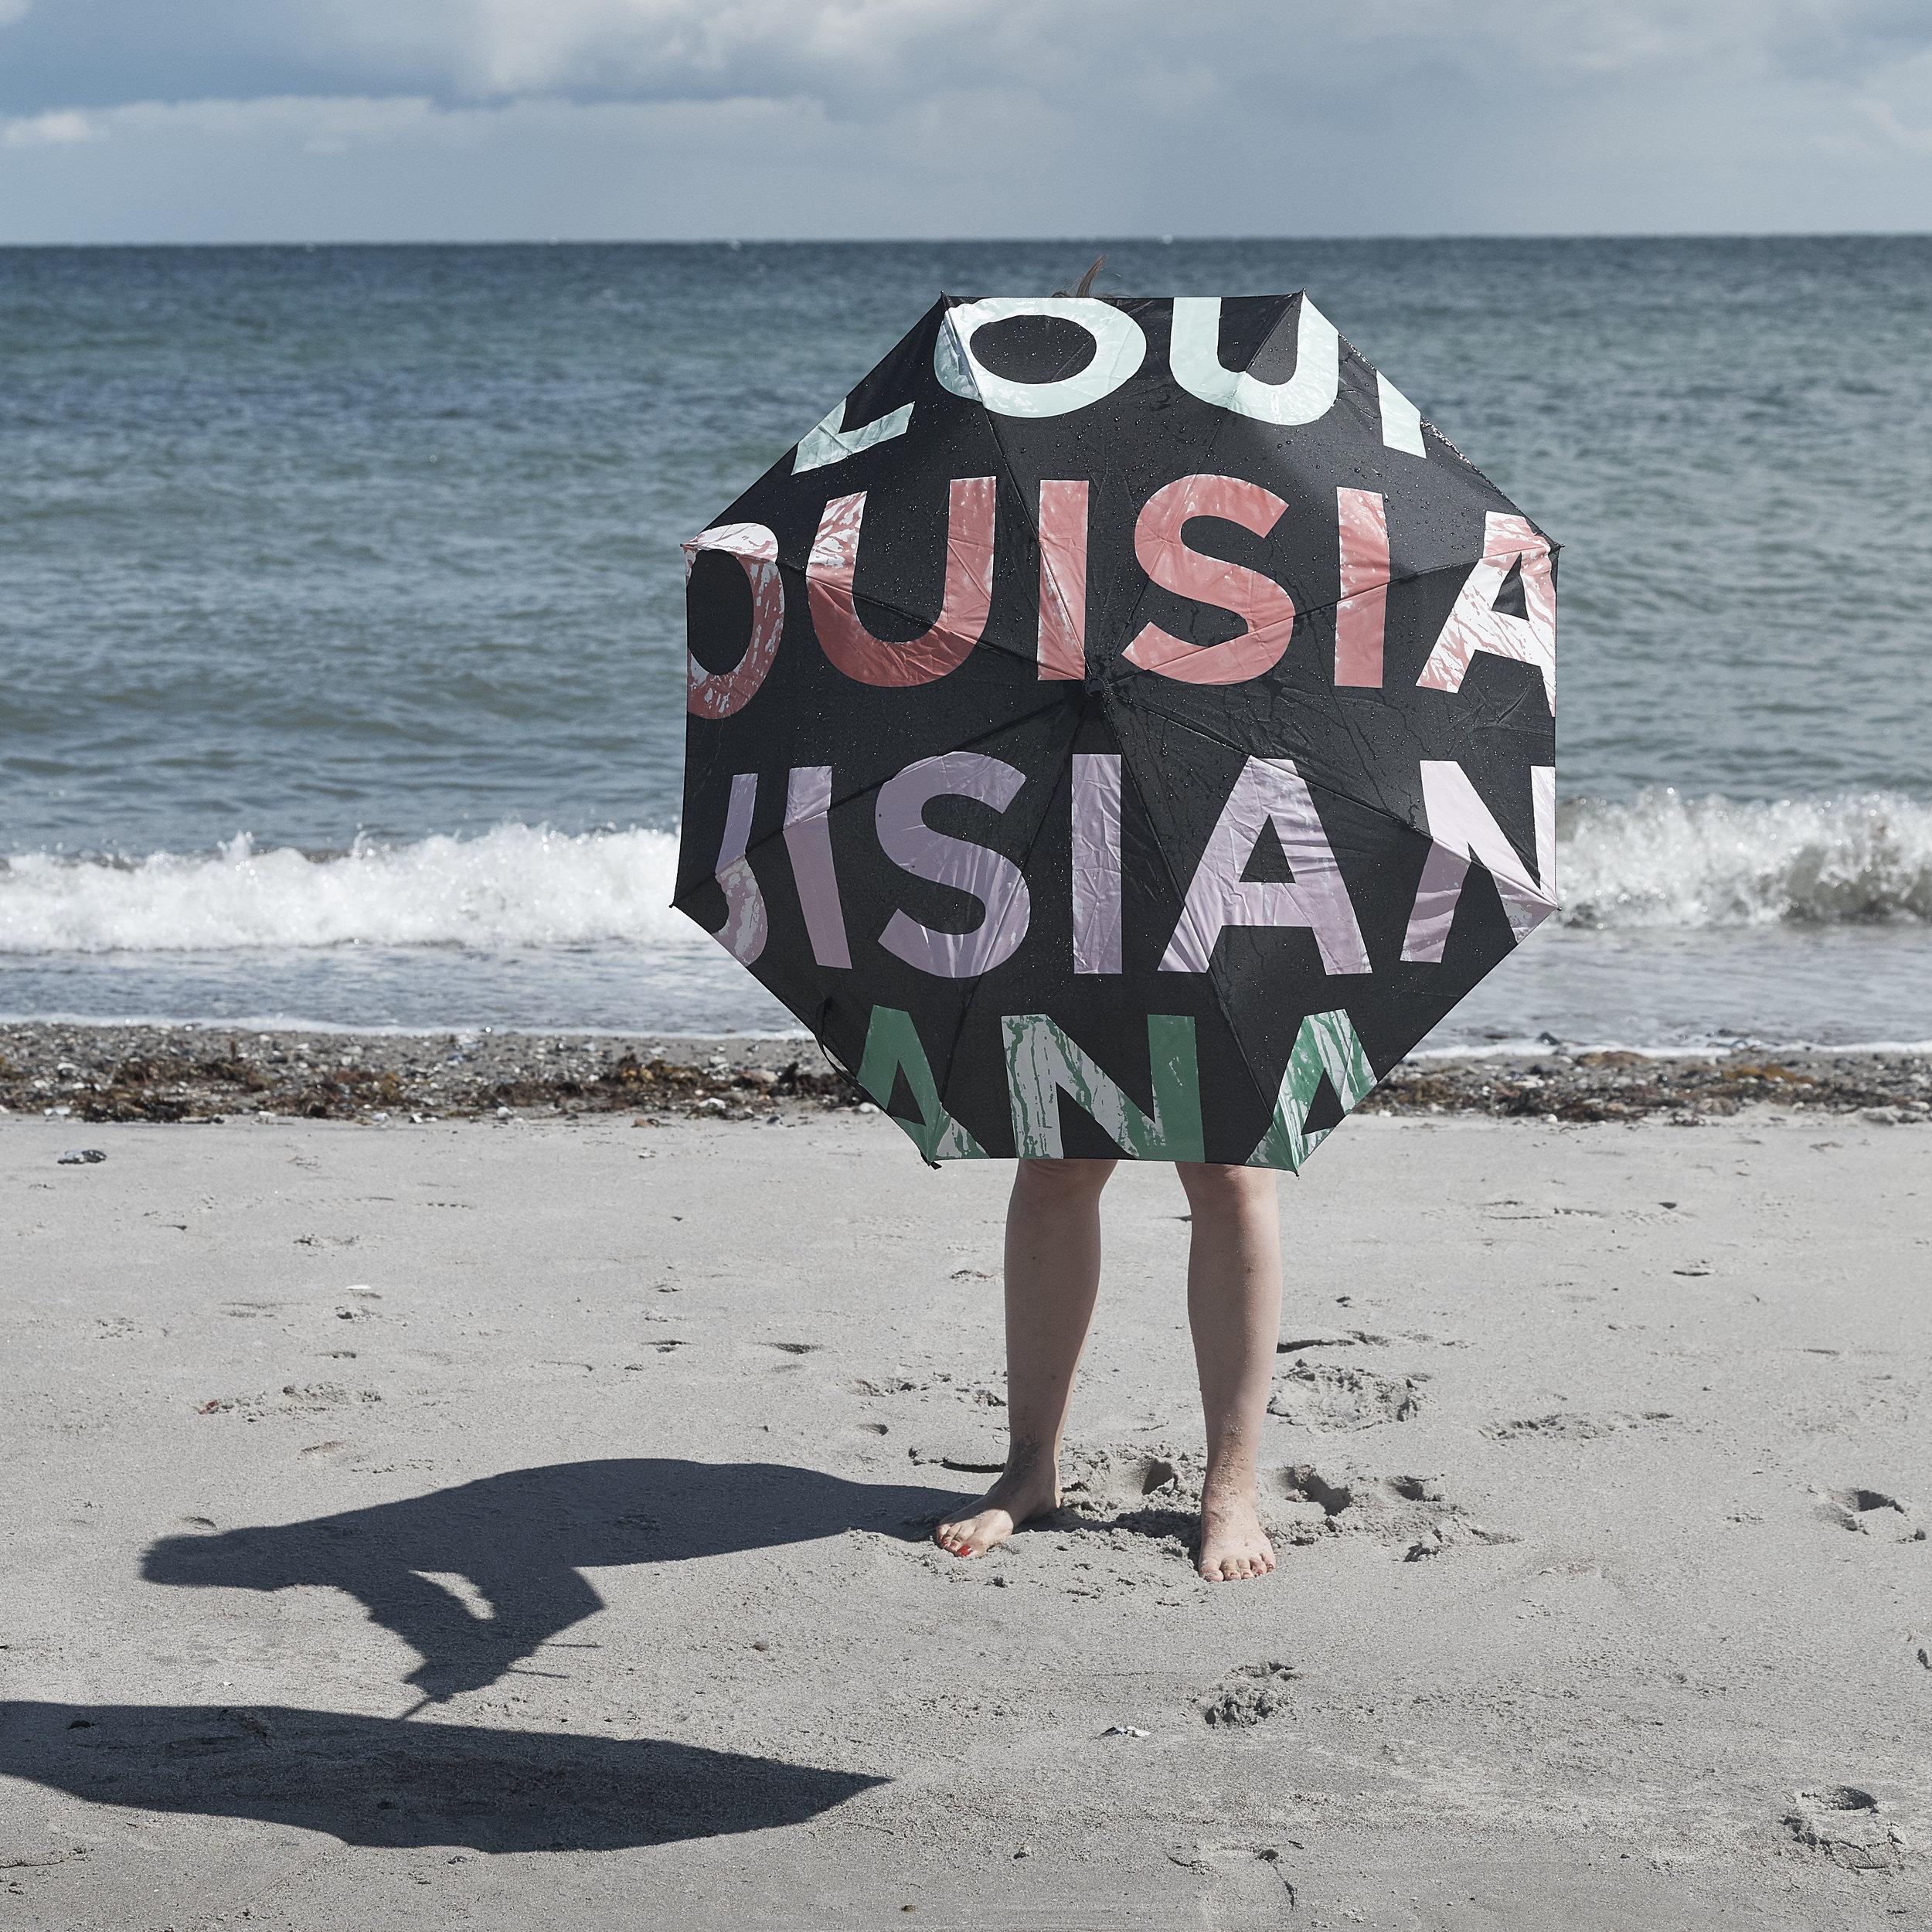 Louisiana_farve_2_lille.jpg